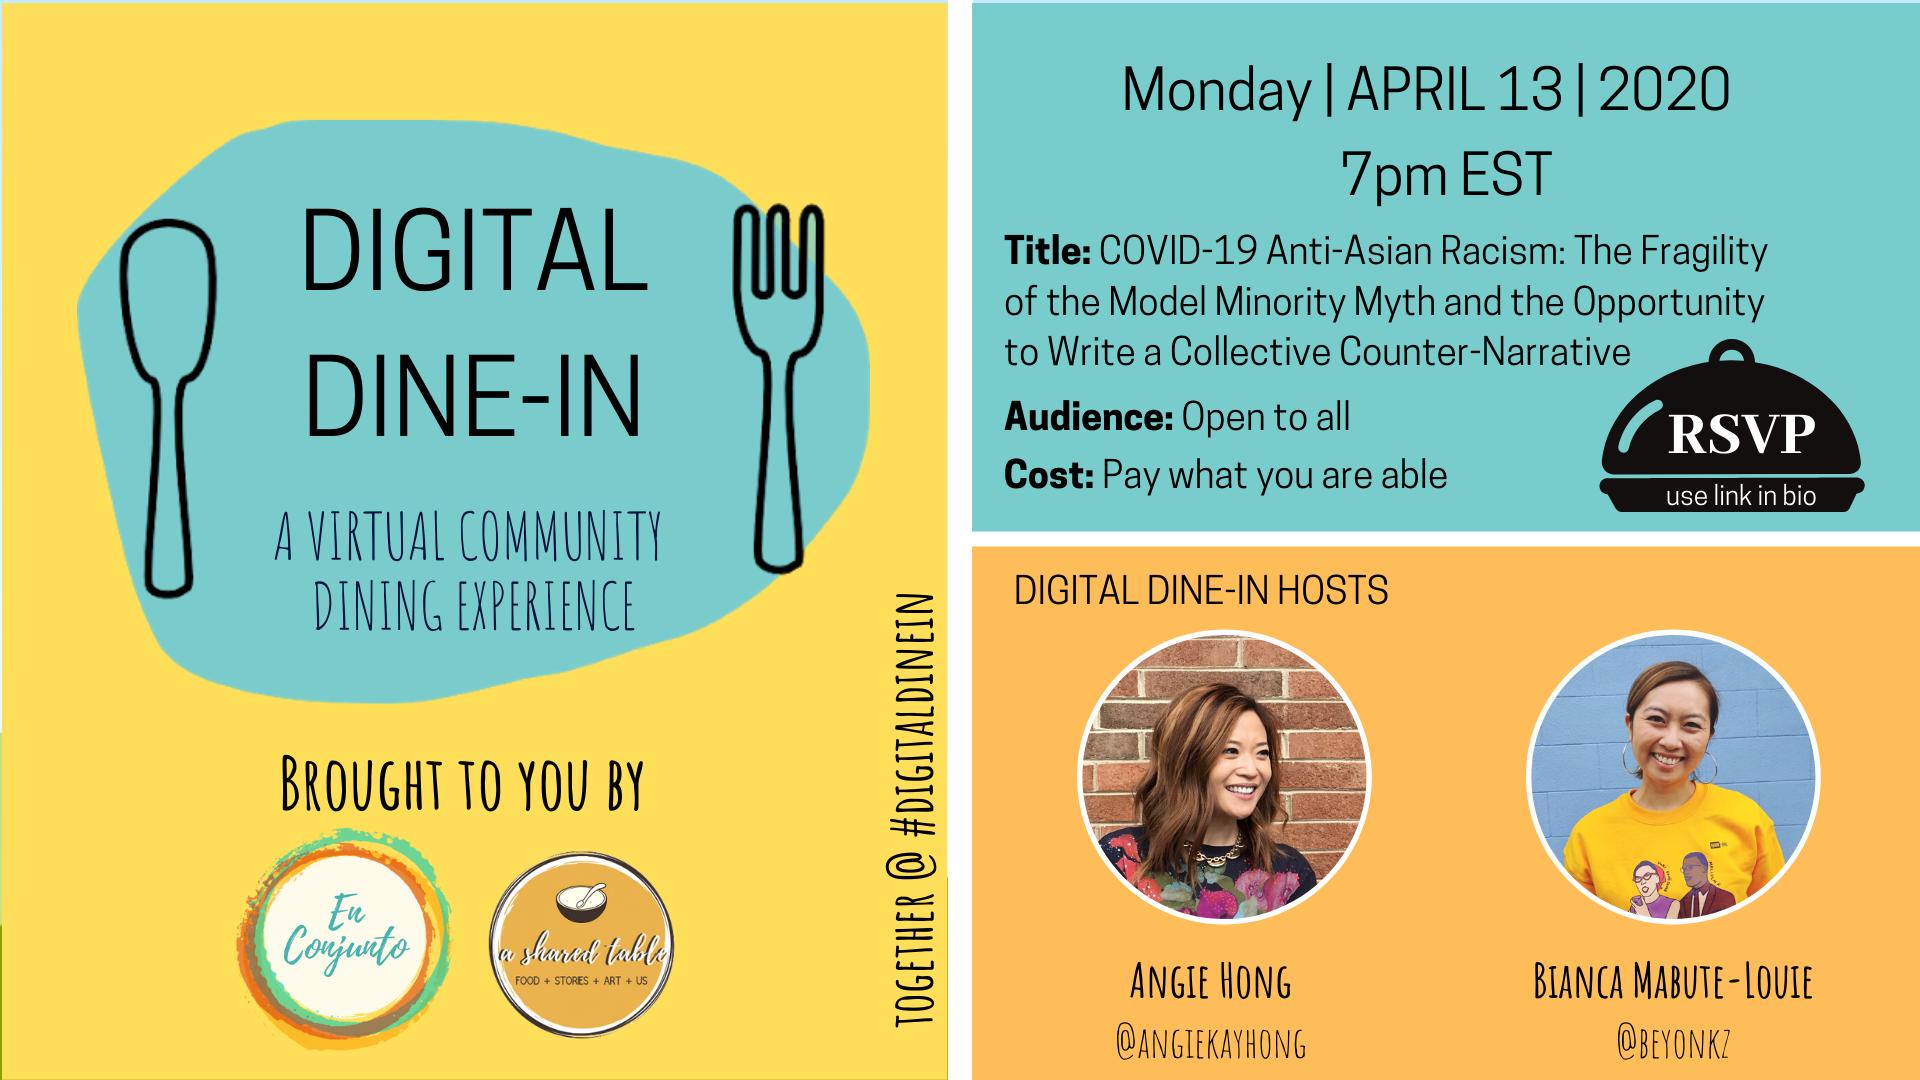 April 13 Digital Dine-In Information